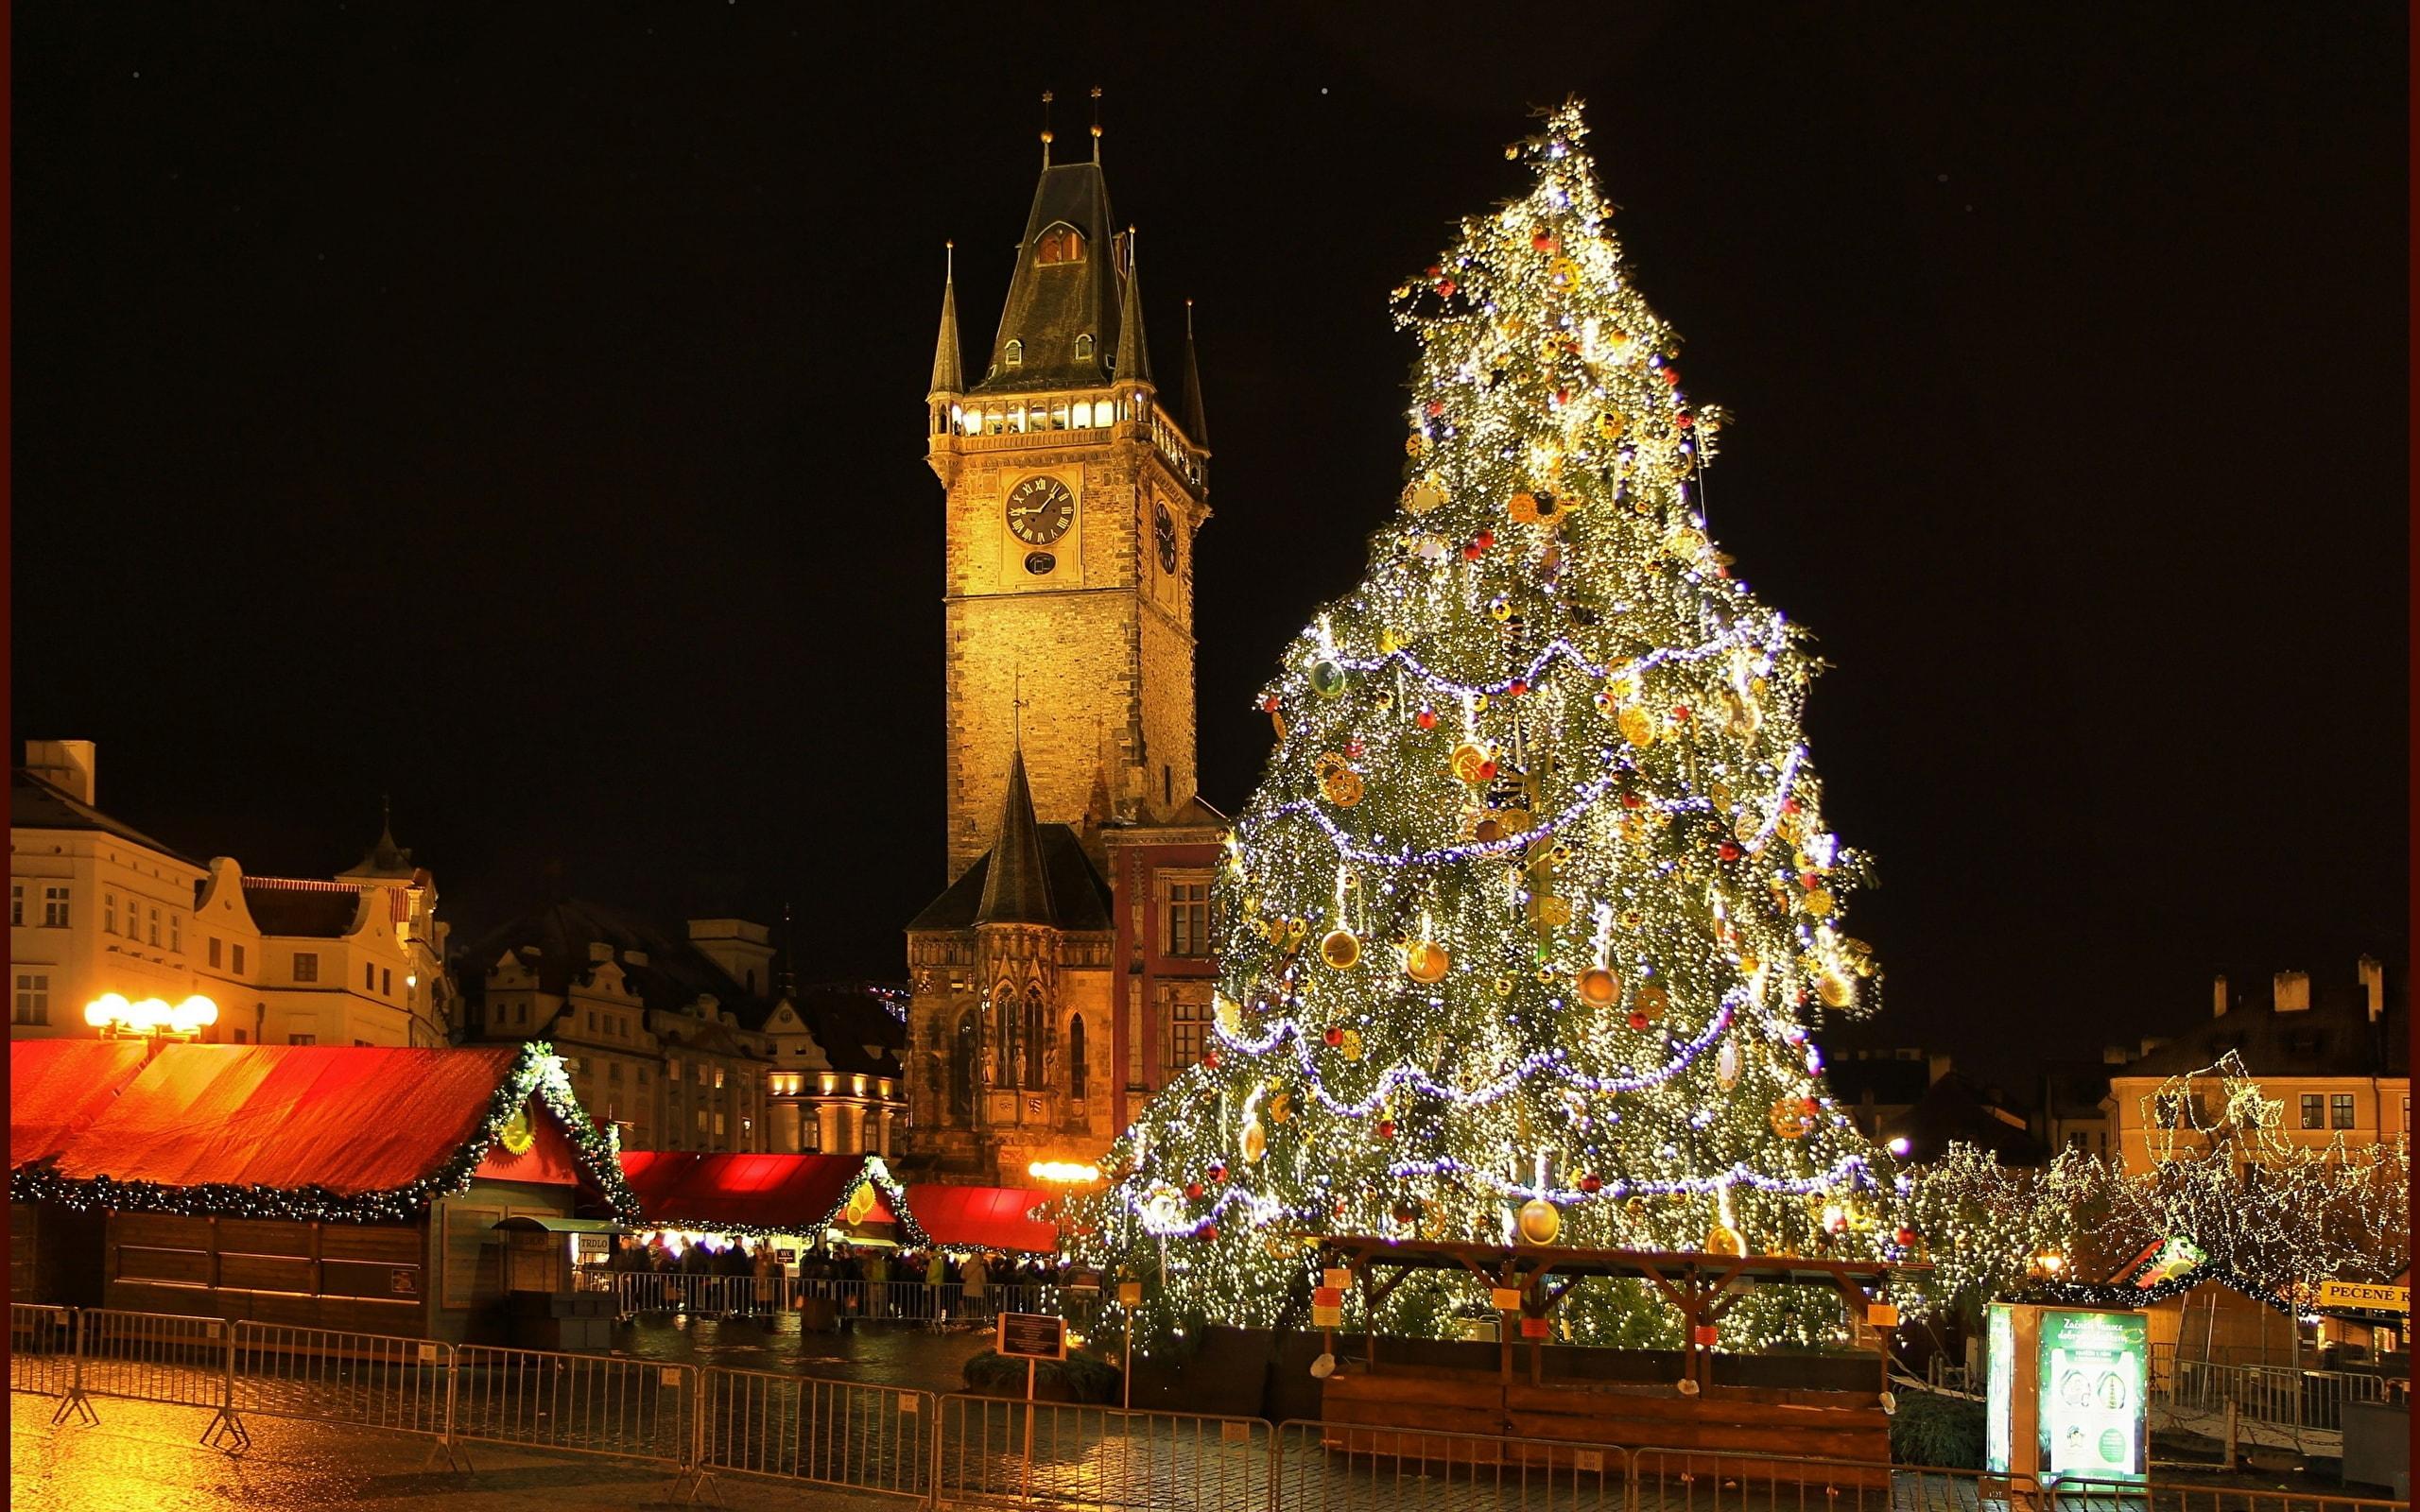 پراگ در کریسمس